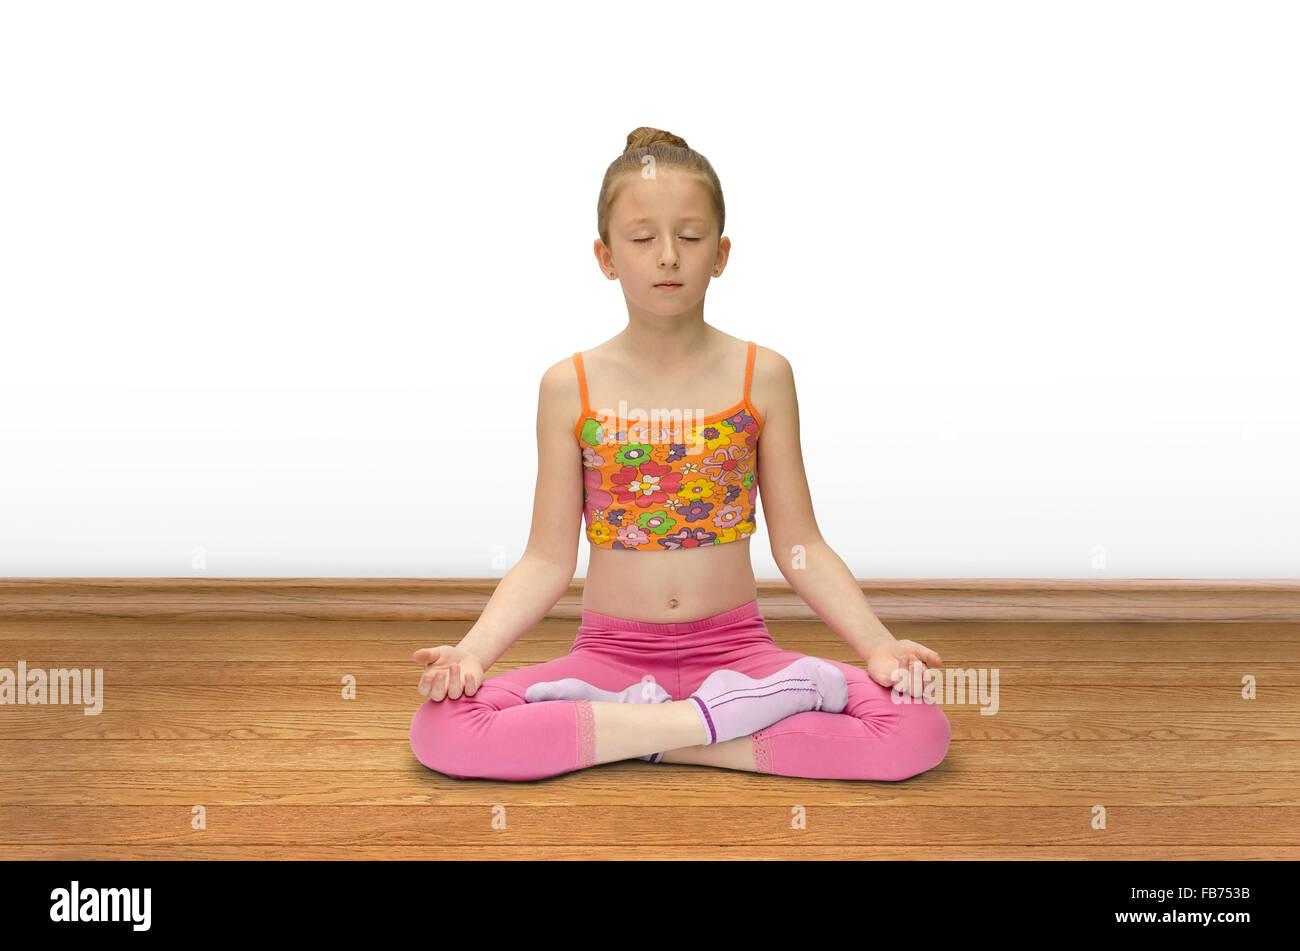 girl practices yoga - Stock Image